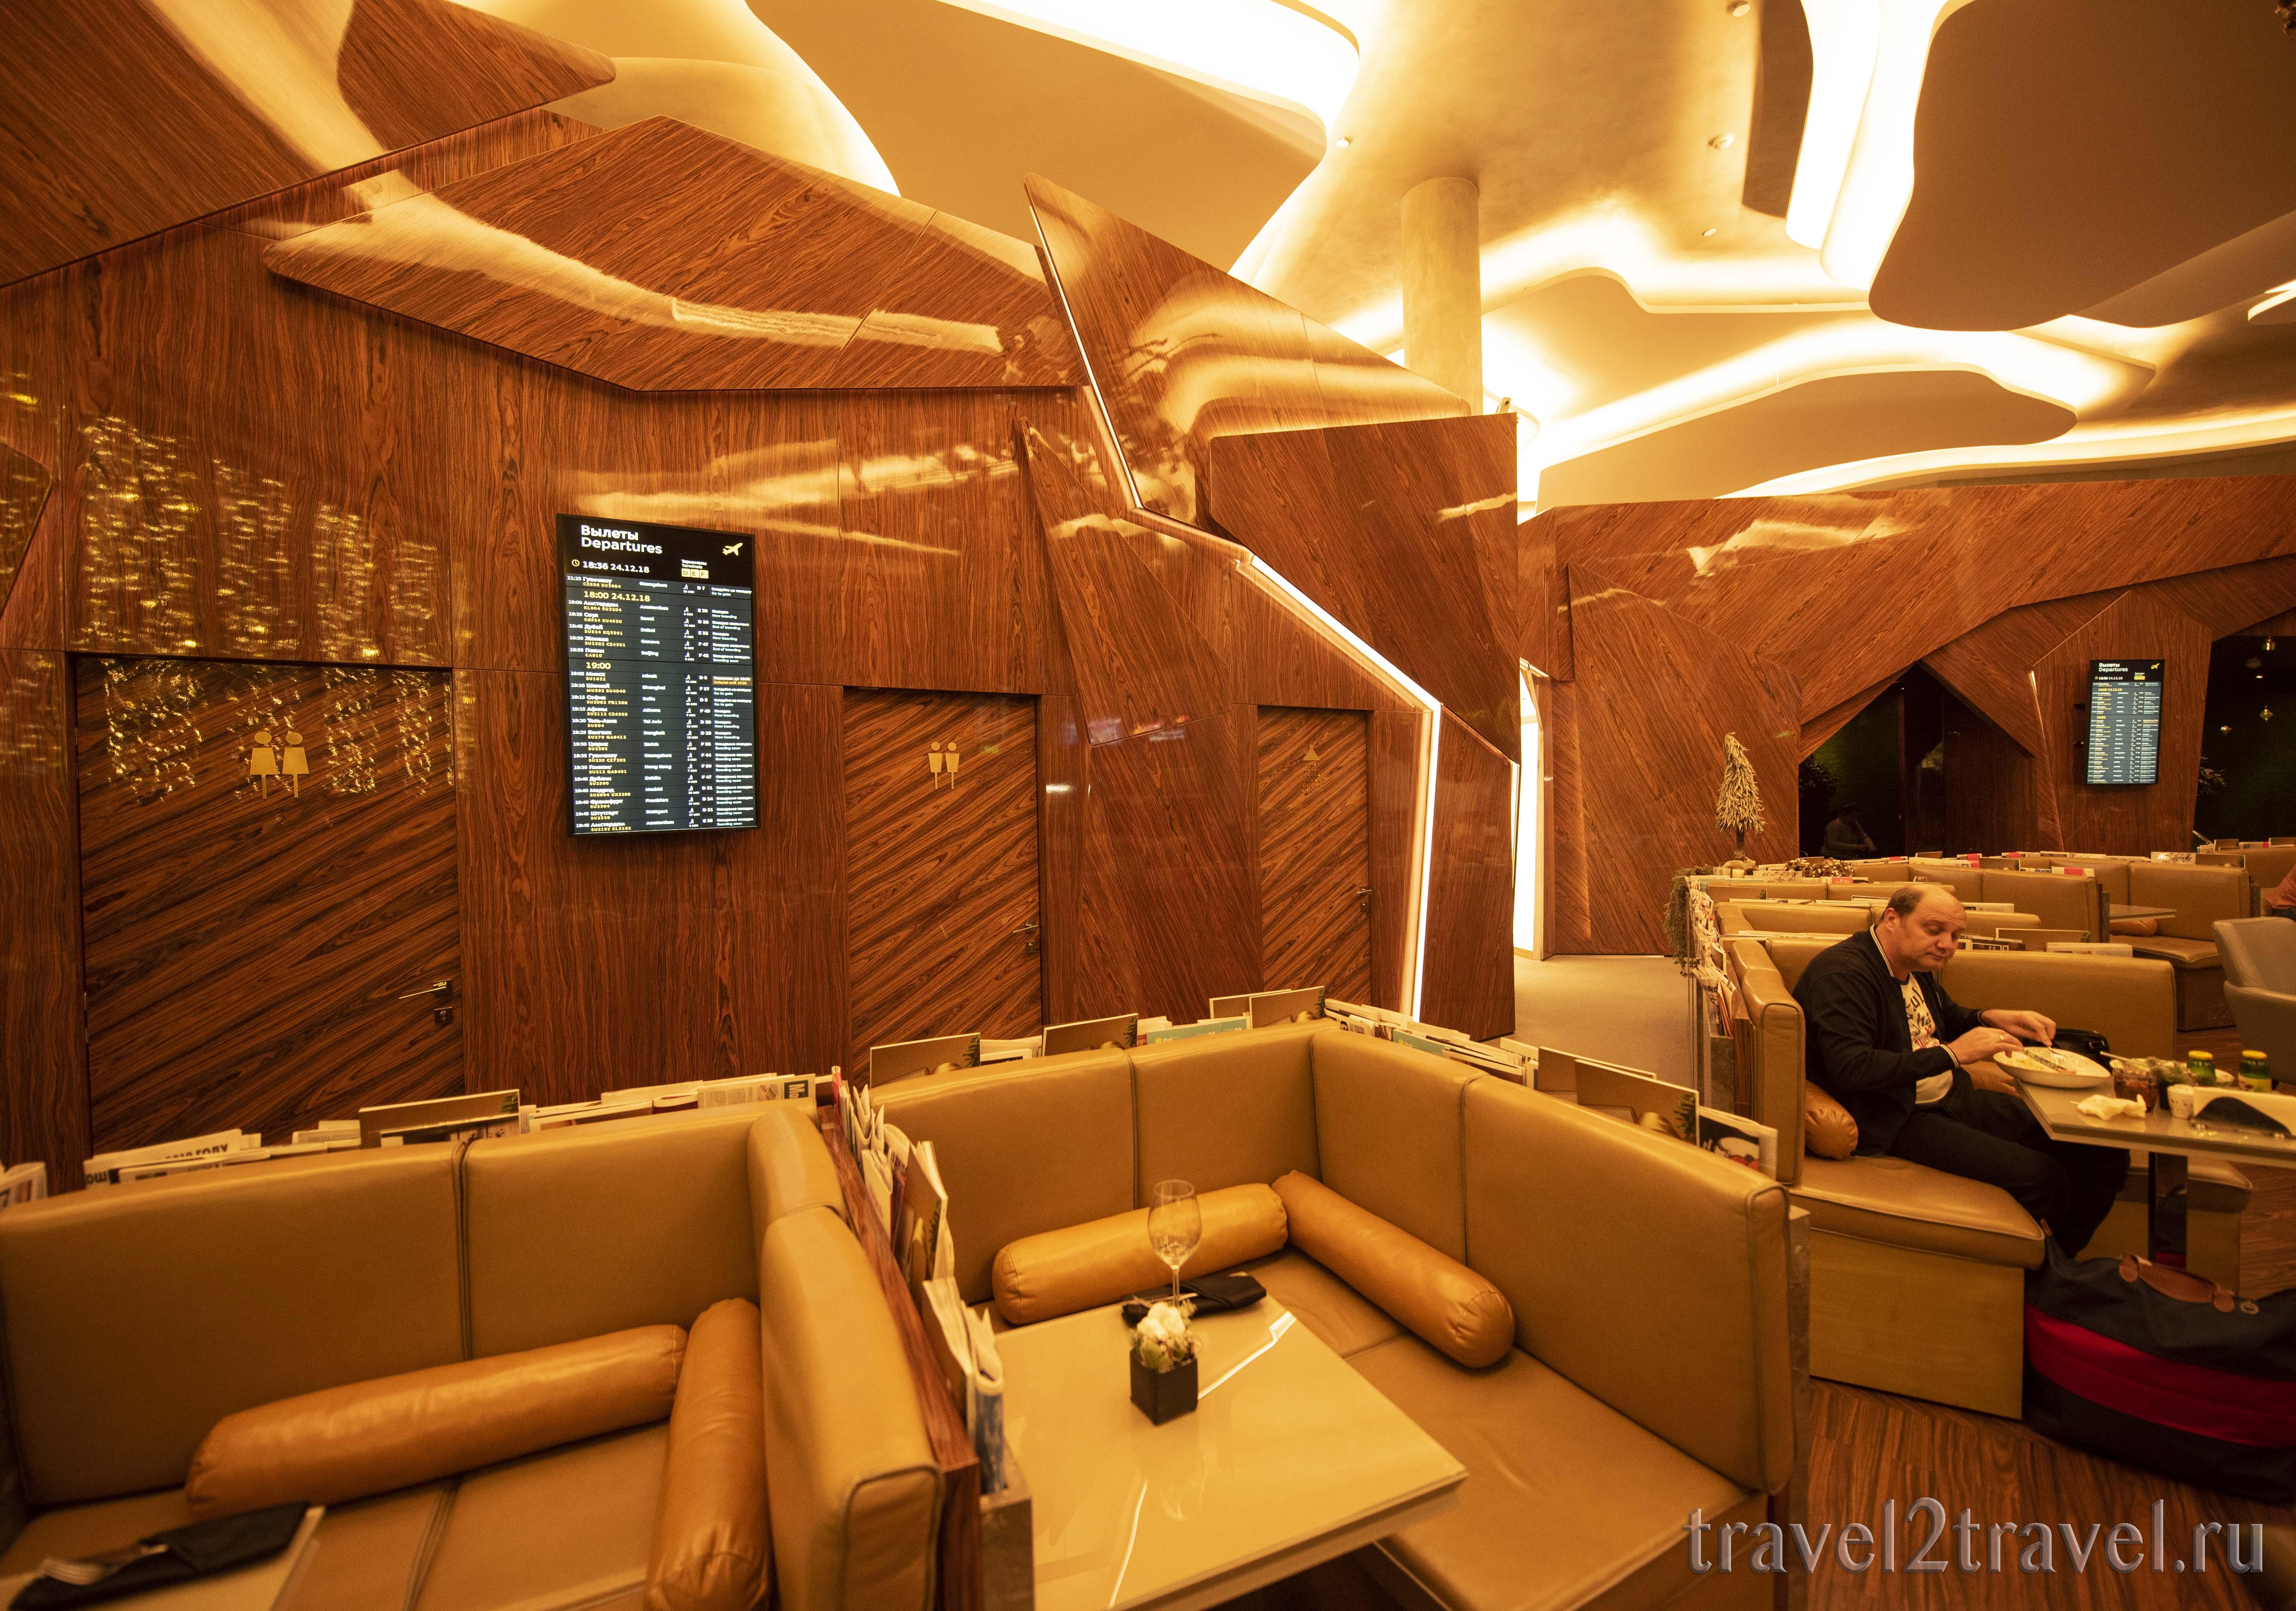 туалетные и душевая комната бизнес-зал Mastercard Lounge терминал E Шереметьево